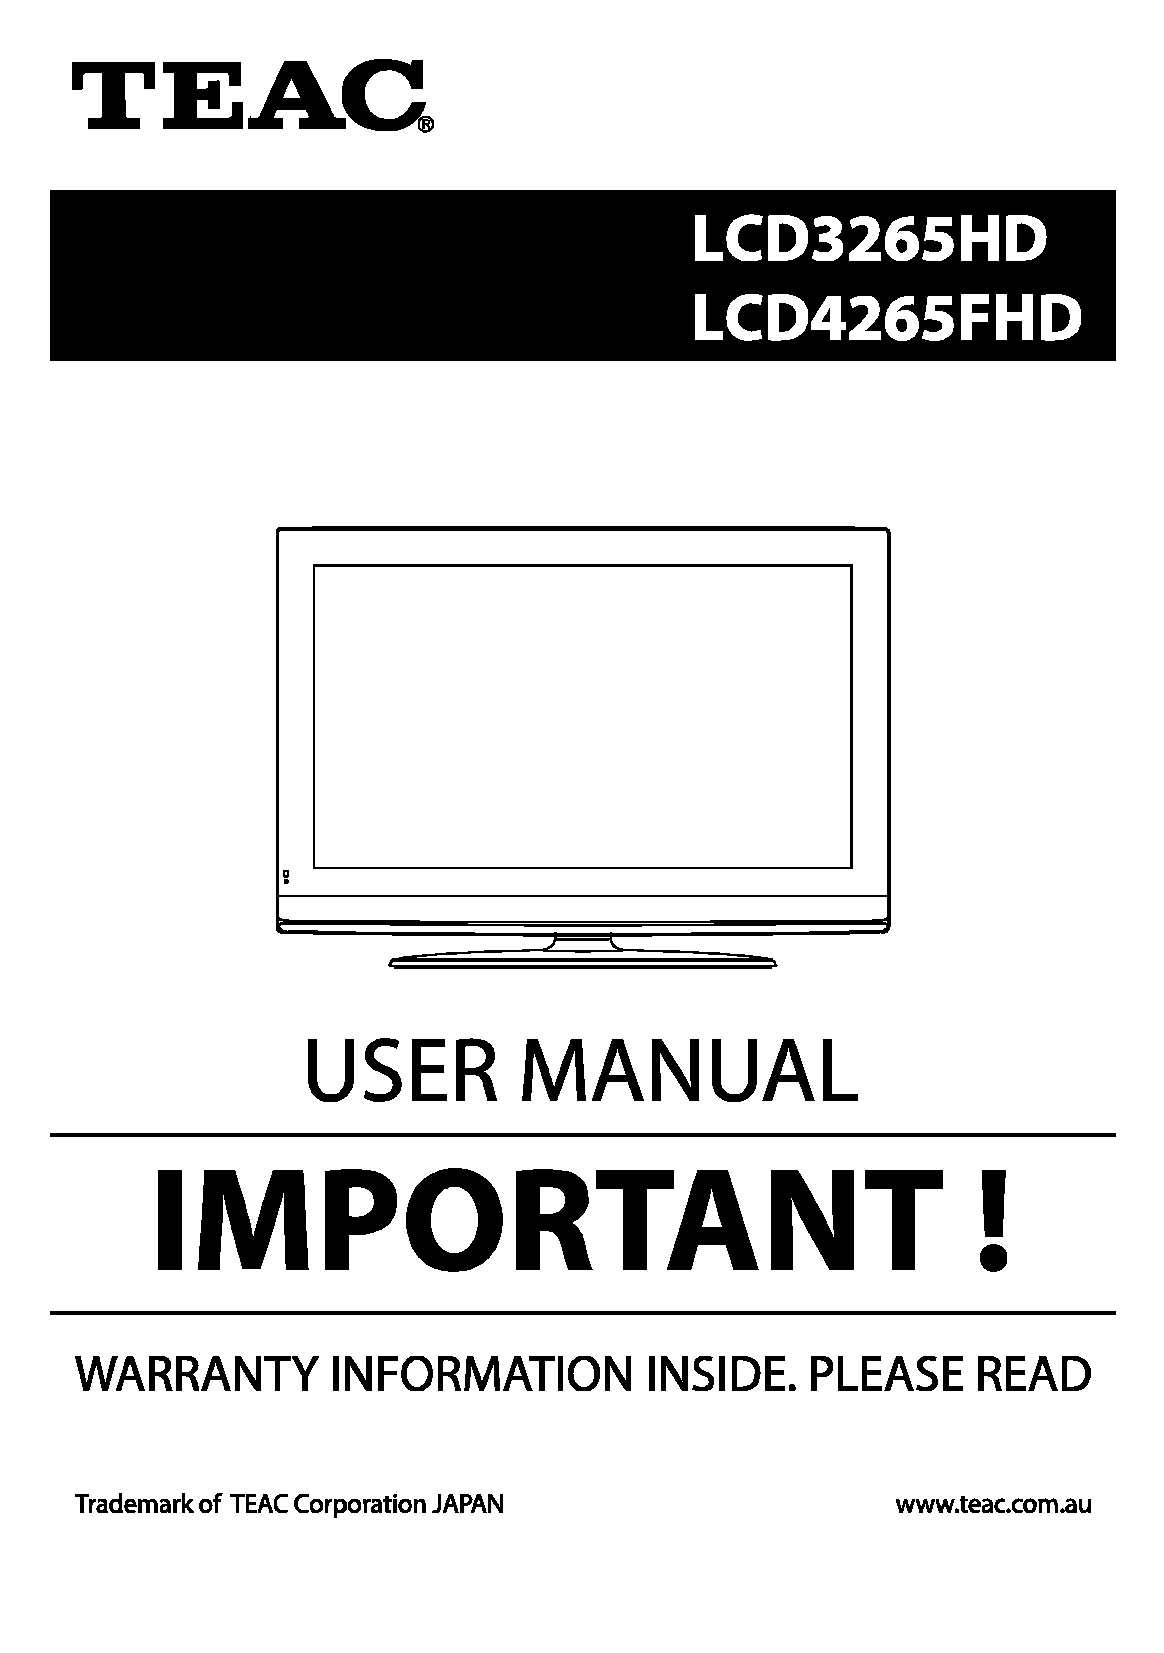 TEAC LCD3265HD LCD4265FHD User Manual